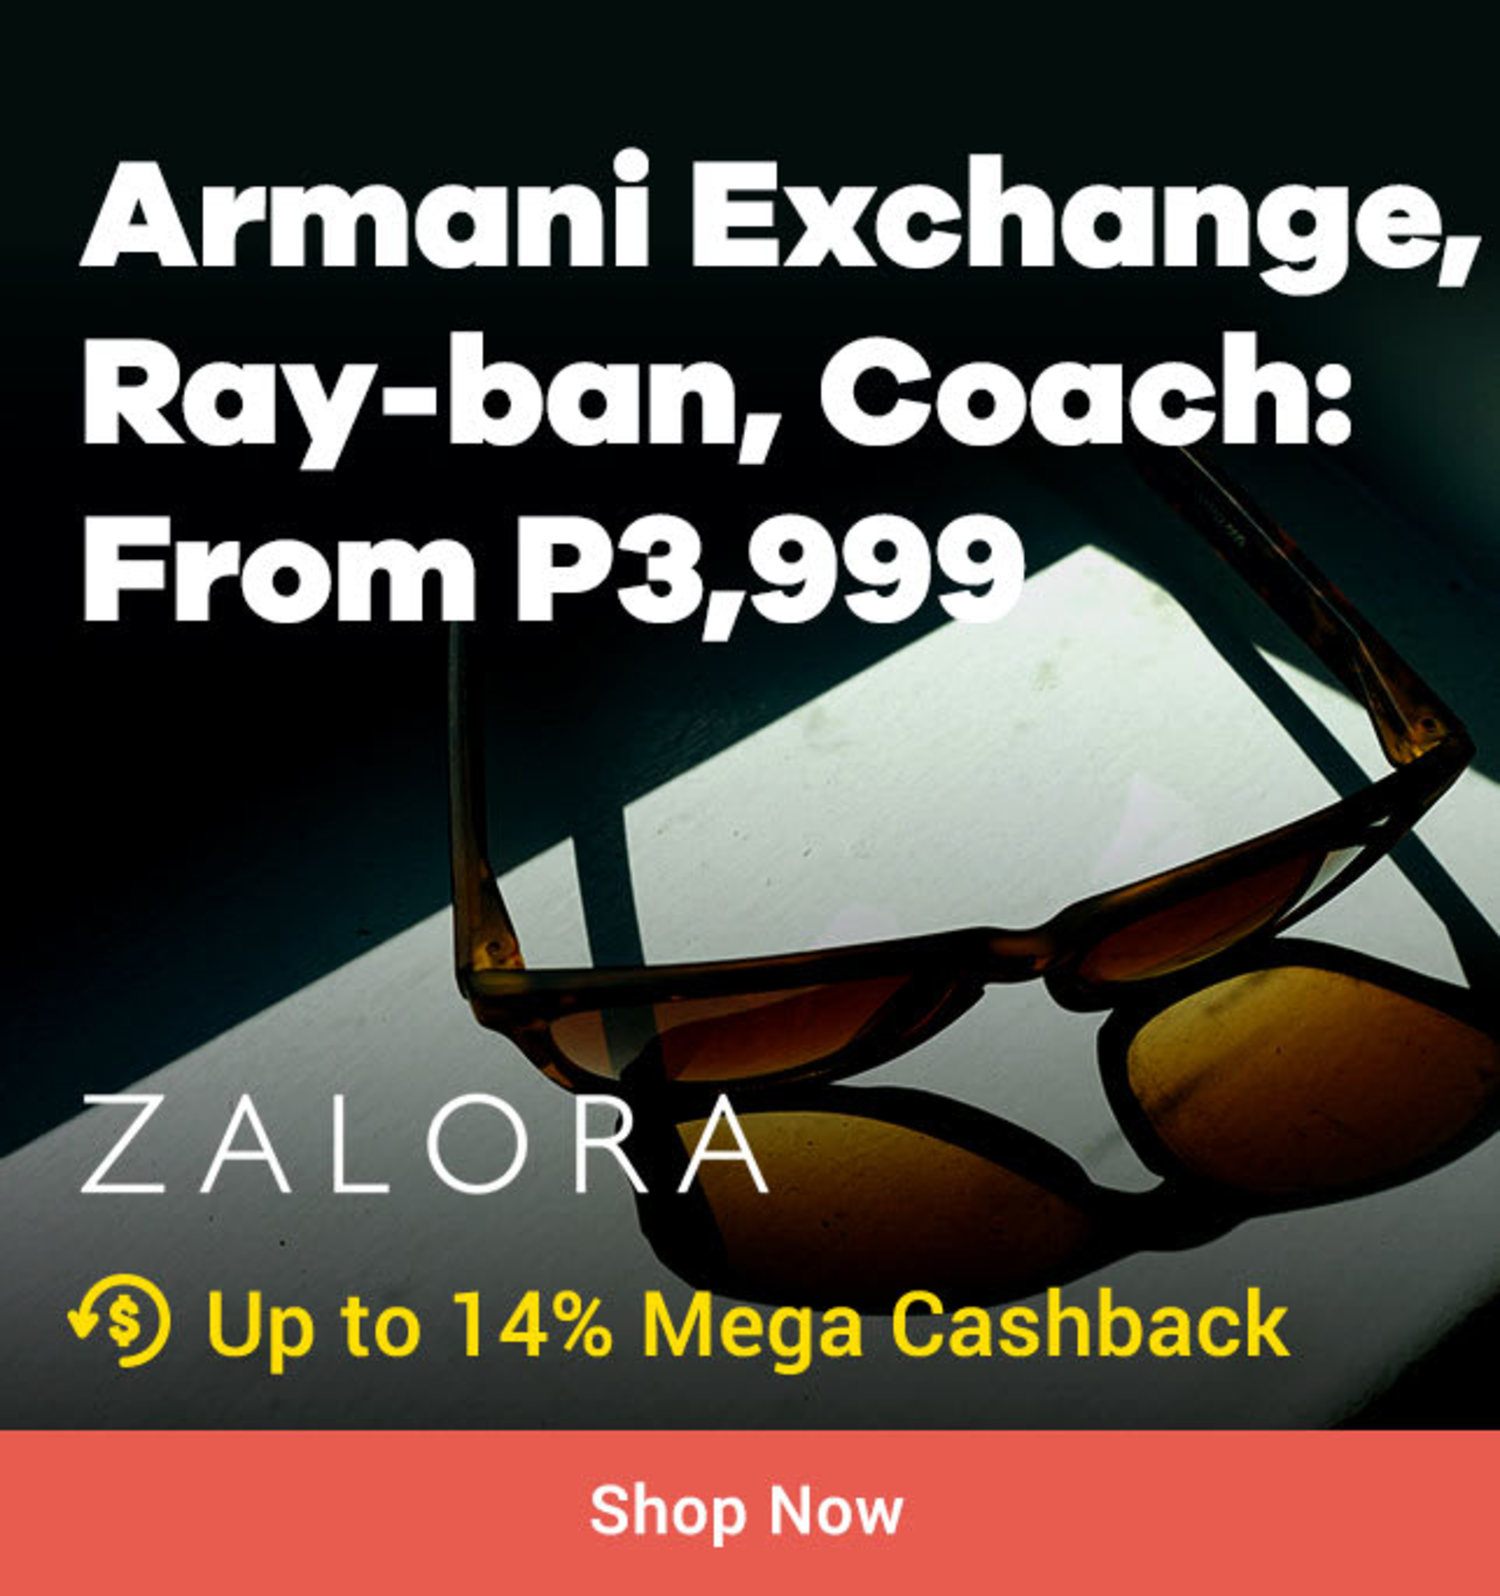 All July ZALORA Armani Exchange, Ray-ban, Coach: From P3,999 + Up to 14% Mega Cashback (<9%)